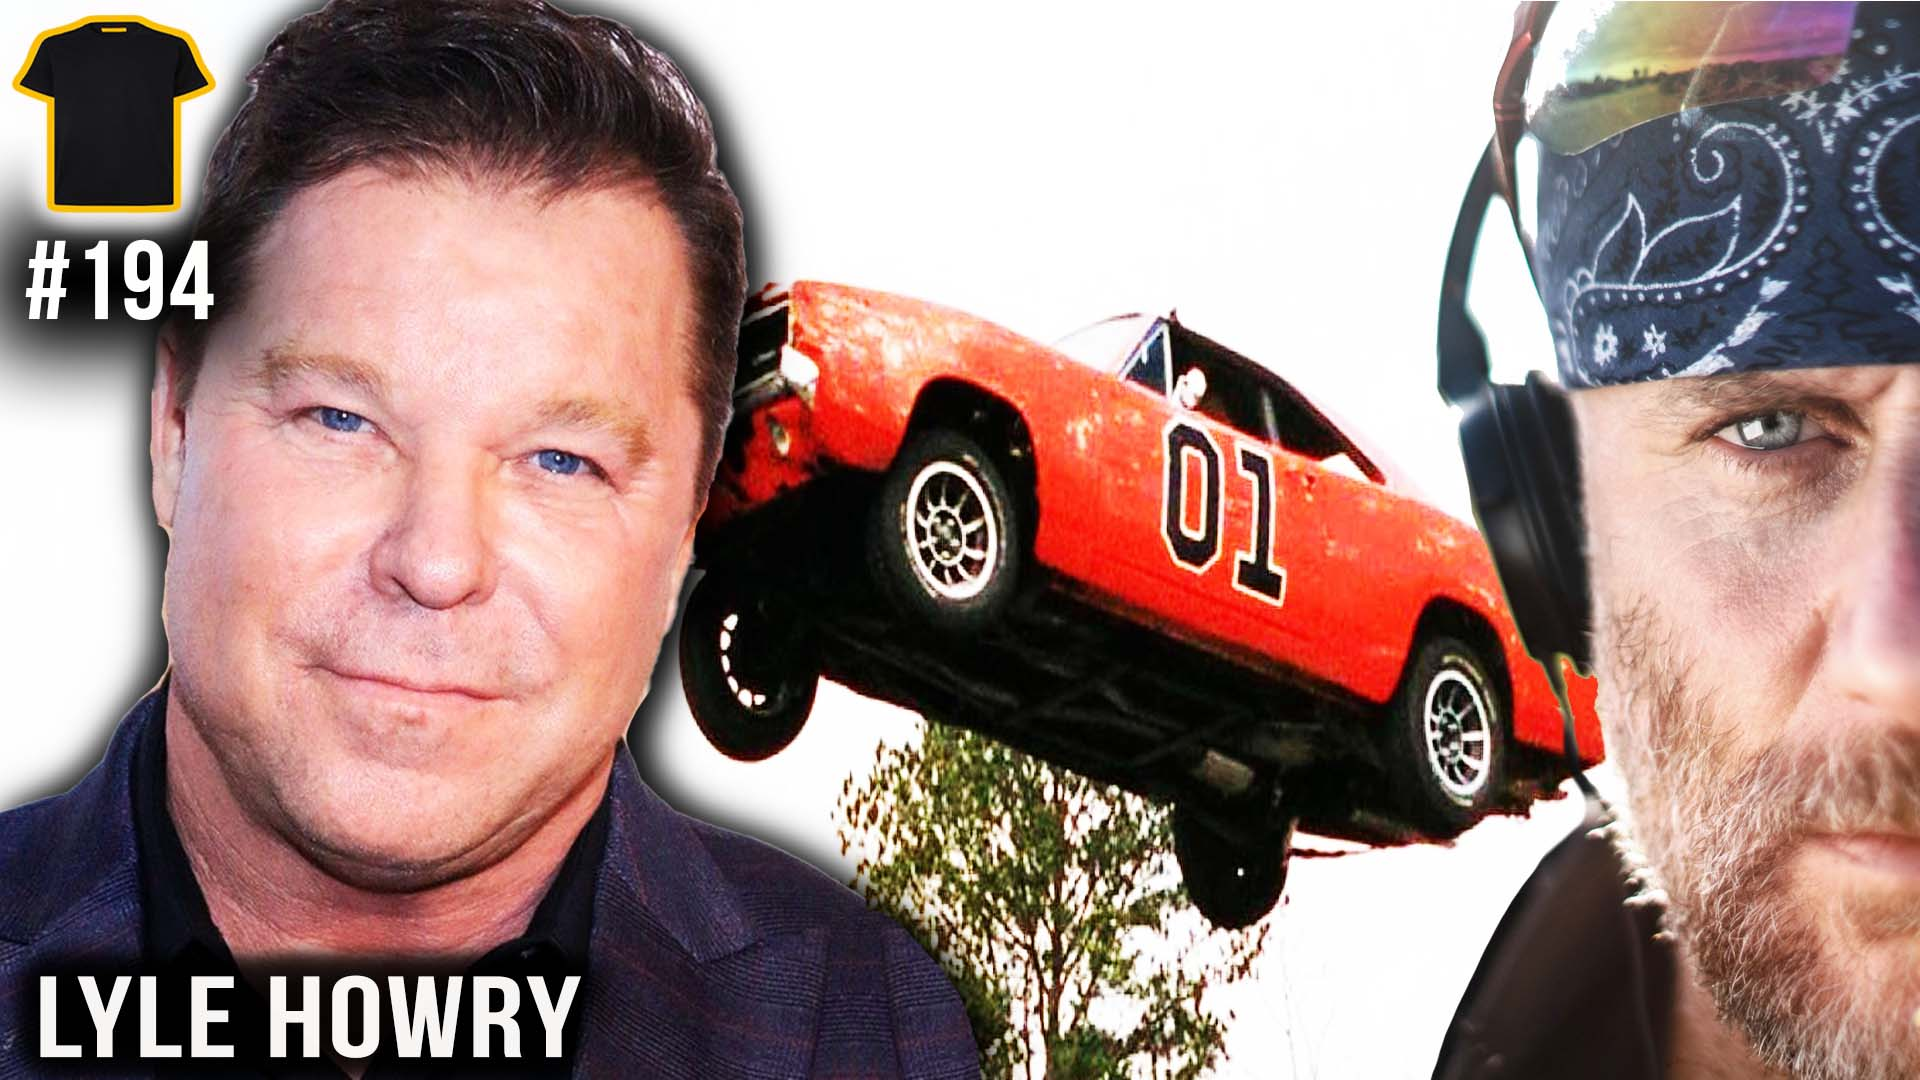 LEGENDARY Hollywood Producer | Lyle Howry |Dukes of Hazzard| #194